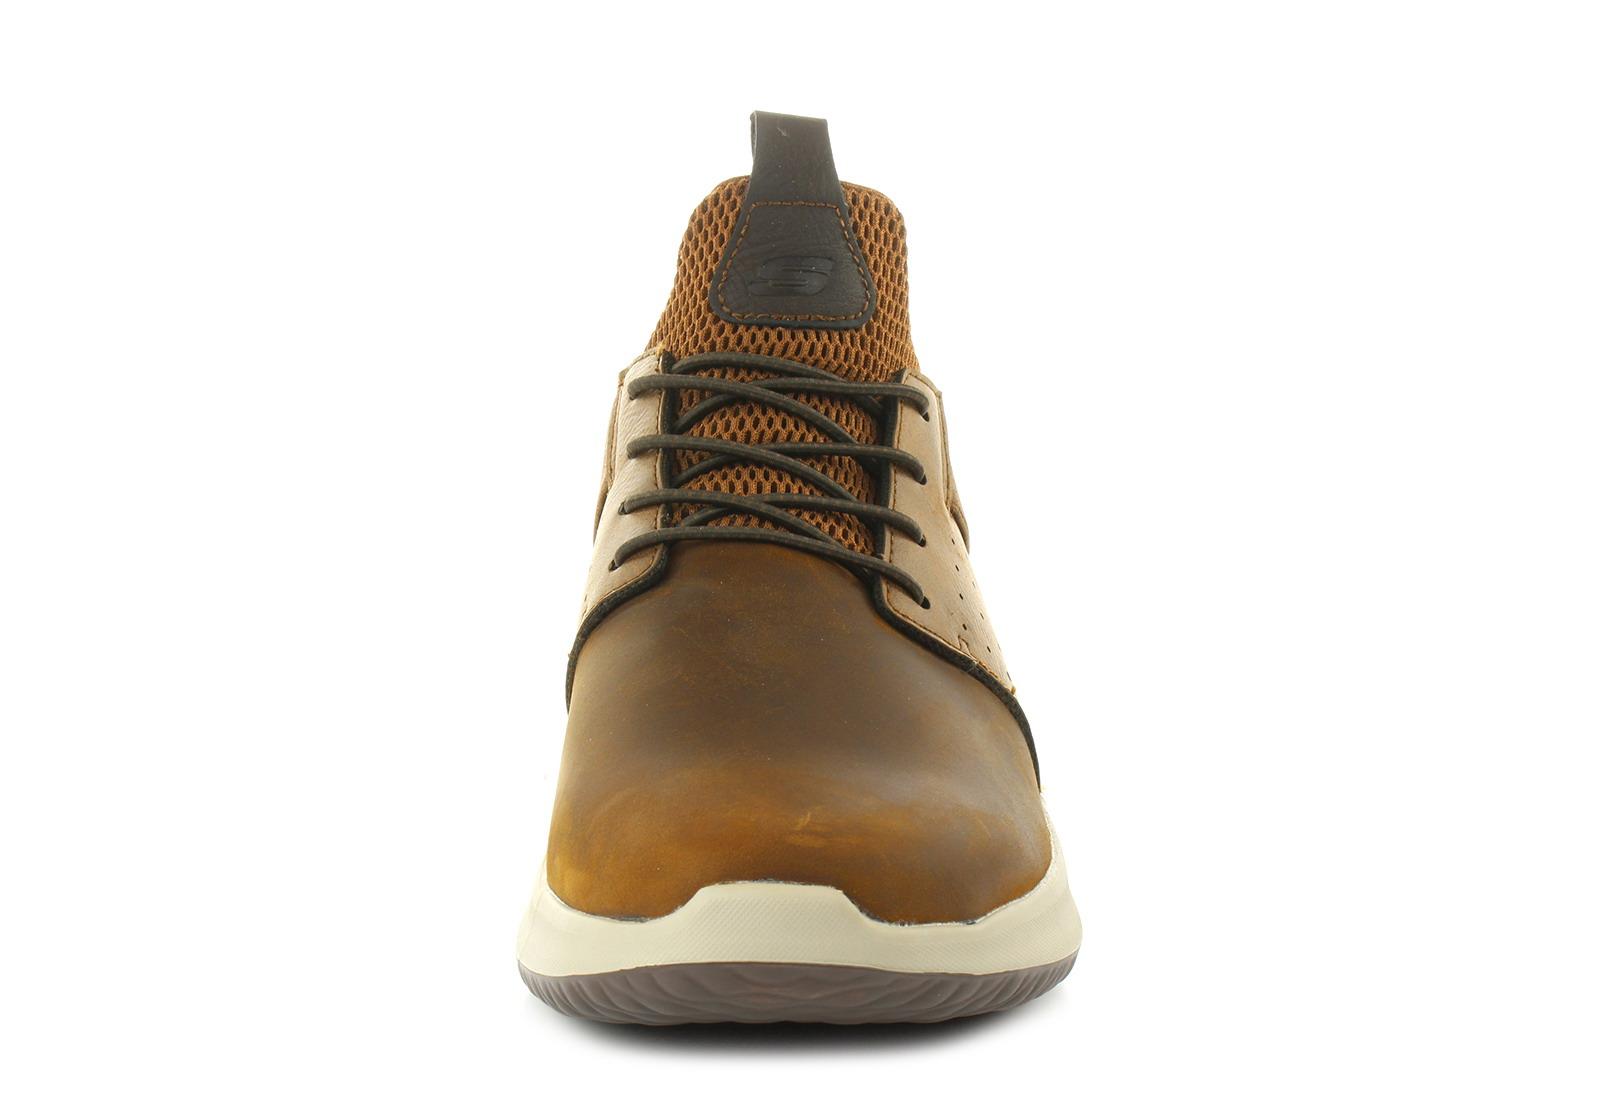 Skechers Shoes Delson Axton 65870 Cdb Online Shop